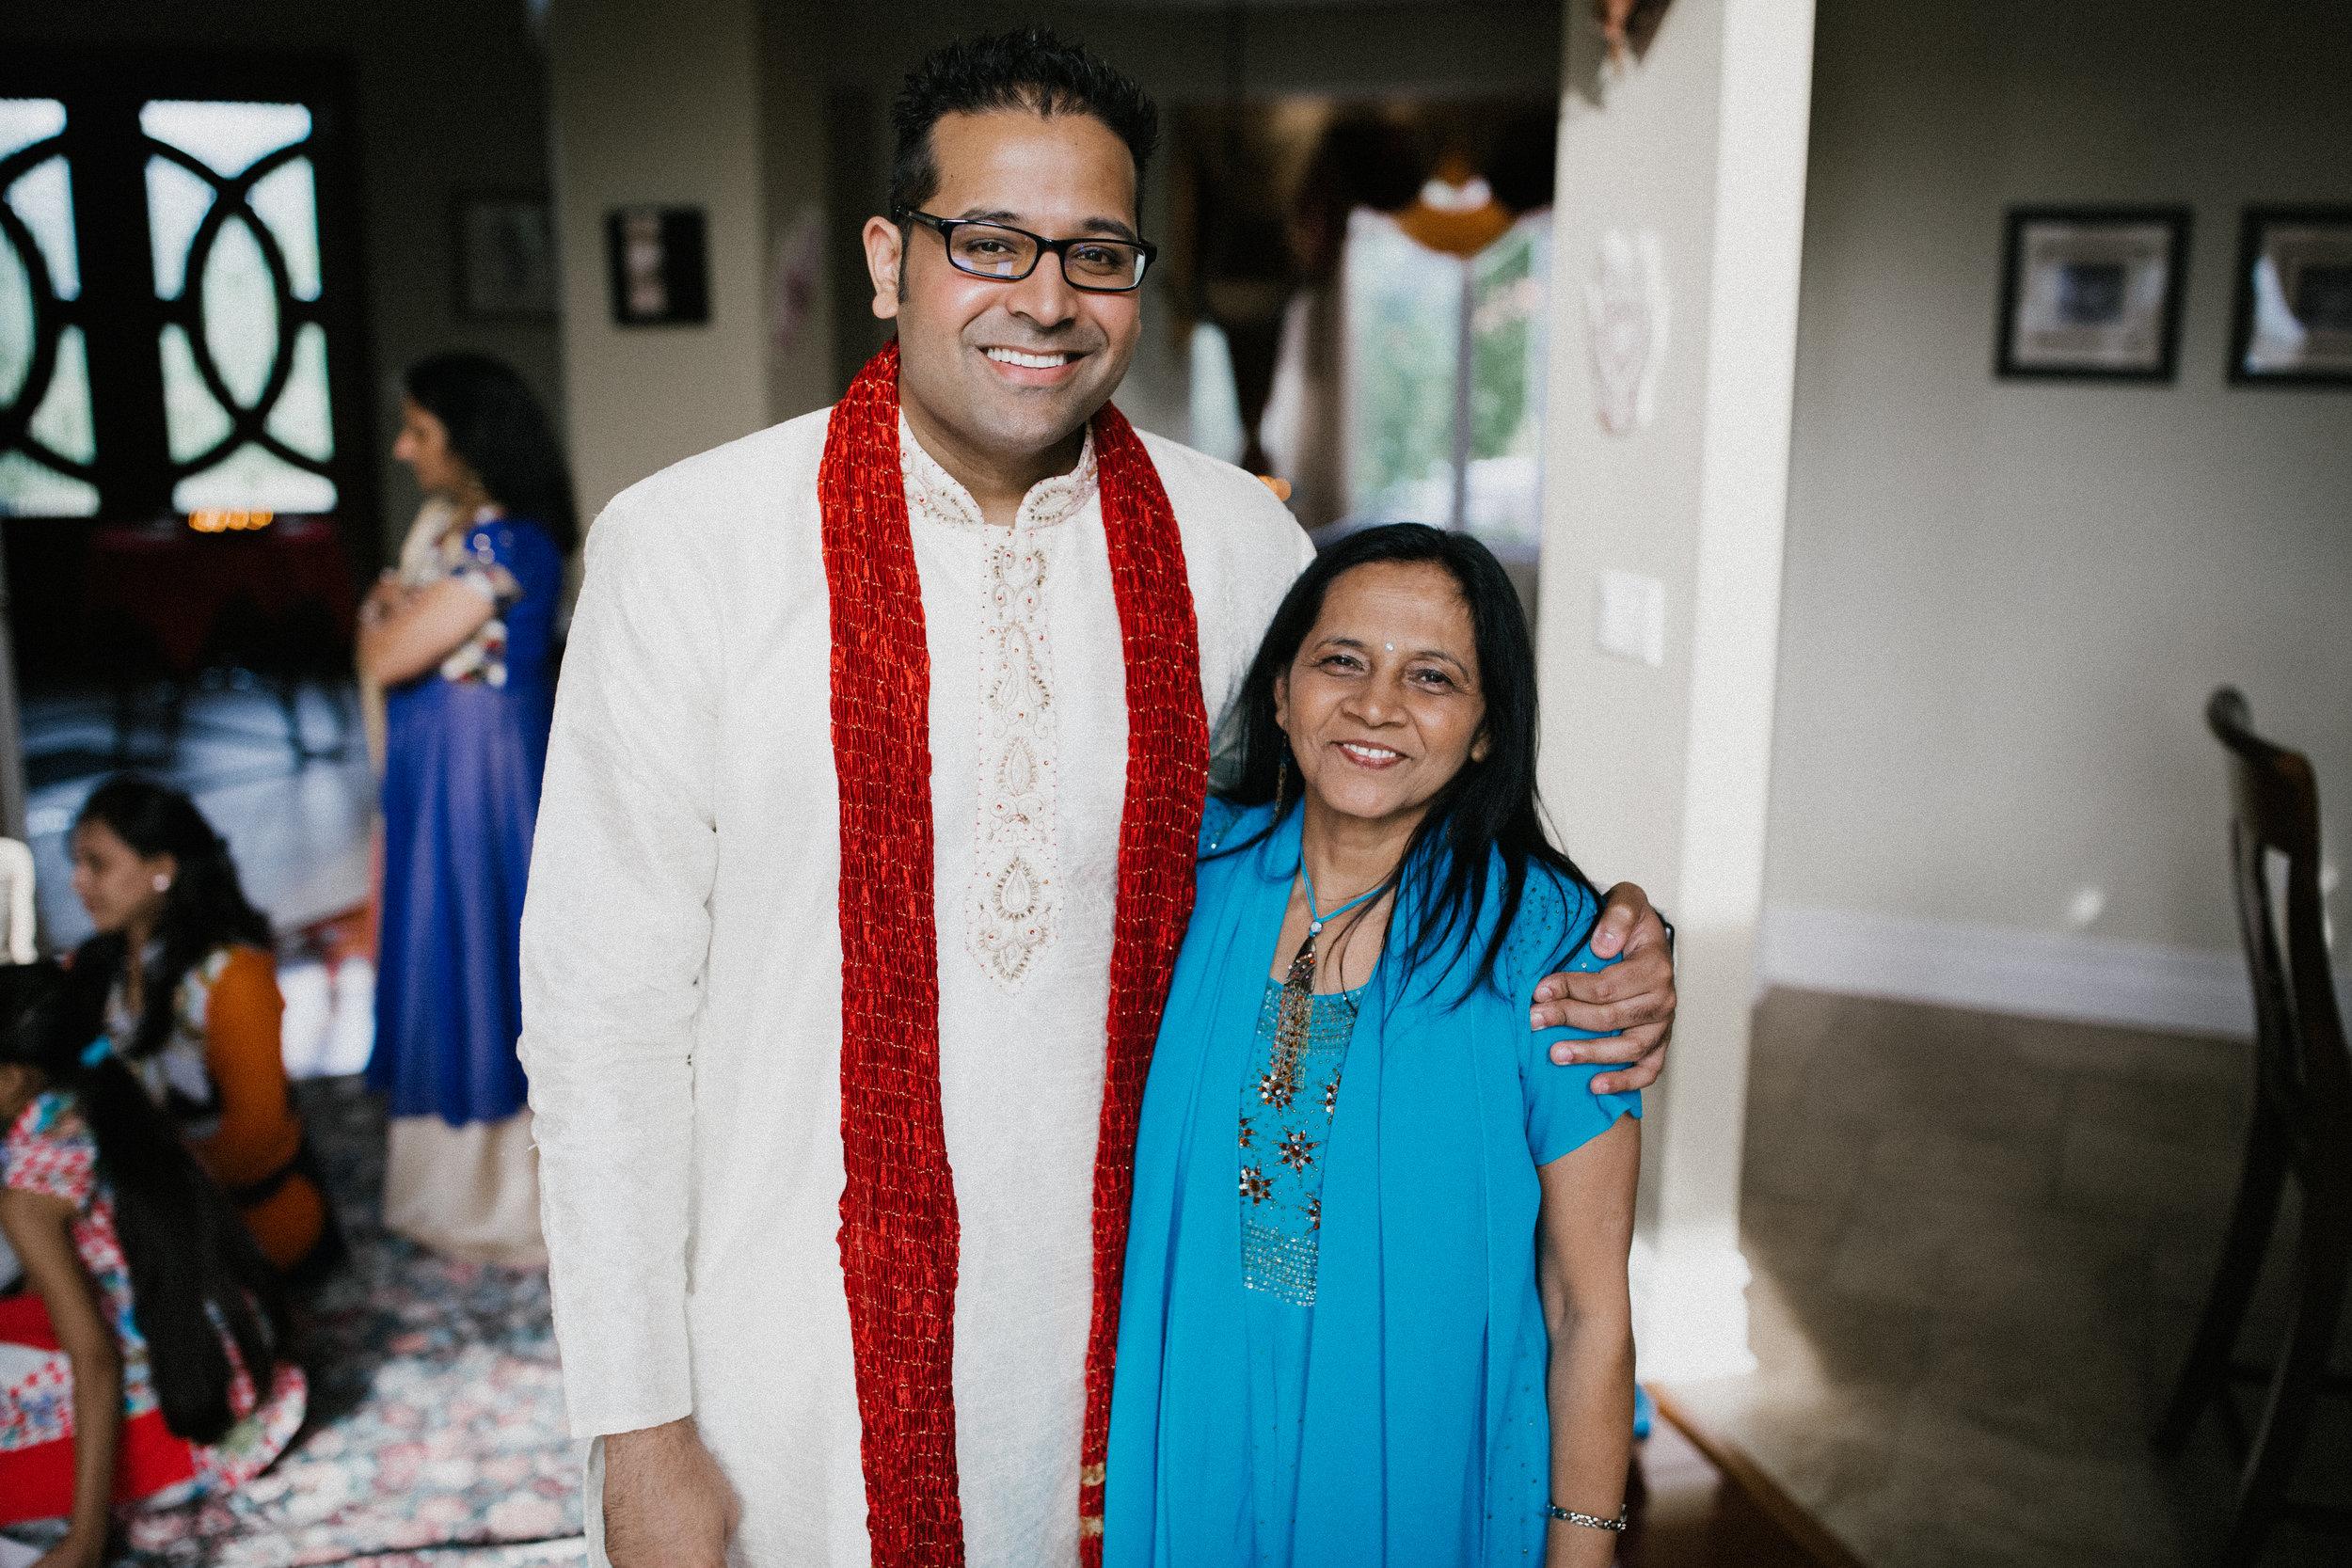 Aparna-Ankit-Patel-Mehndi-Wedding-Photos-0036.jpg